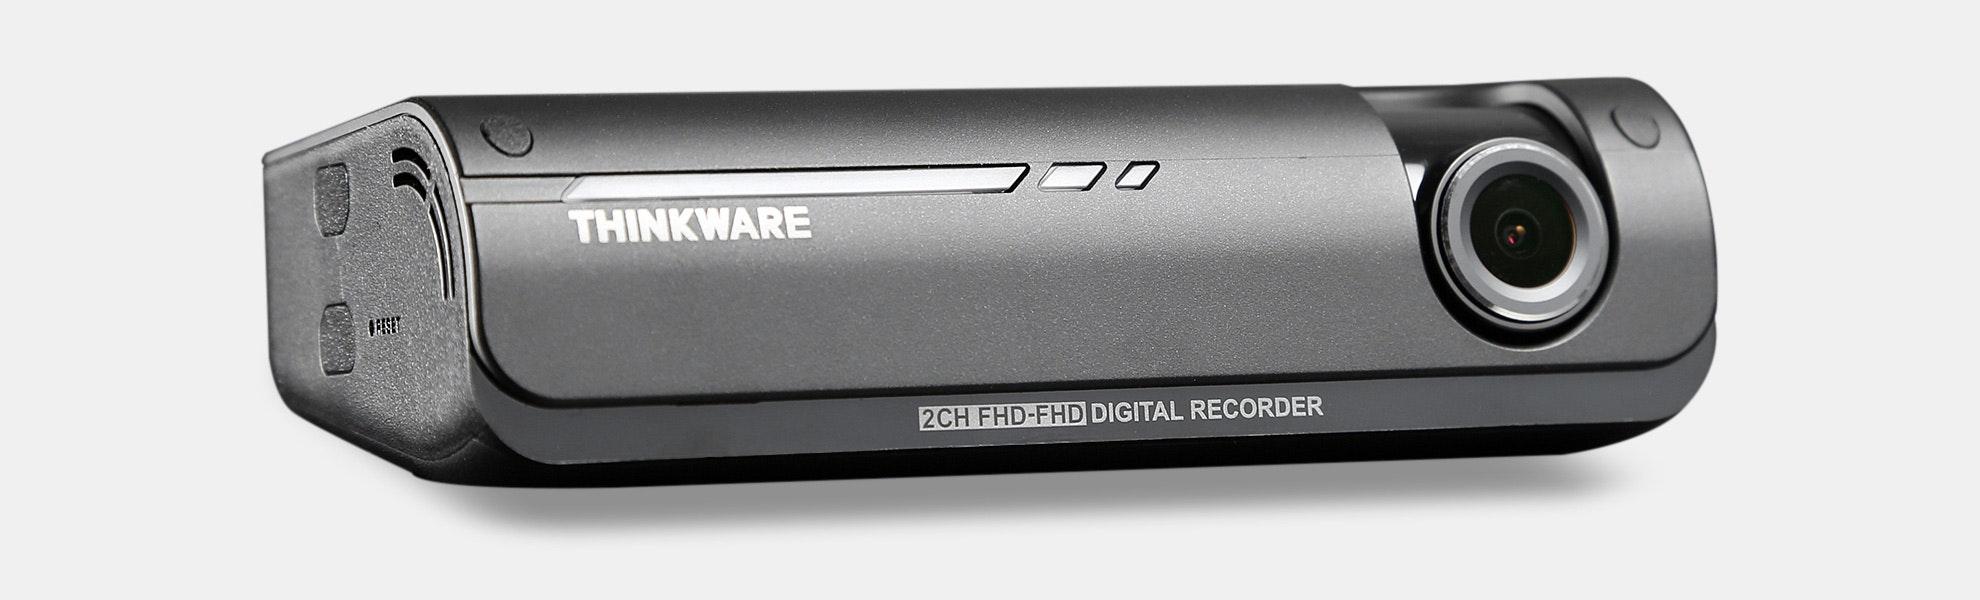 Thinkware F770 Dash Camera